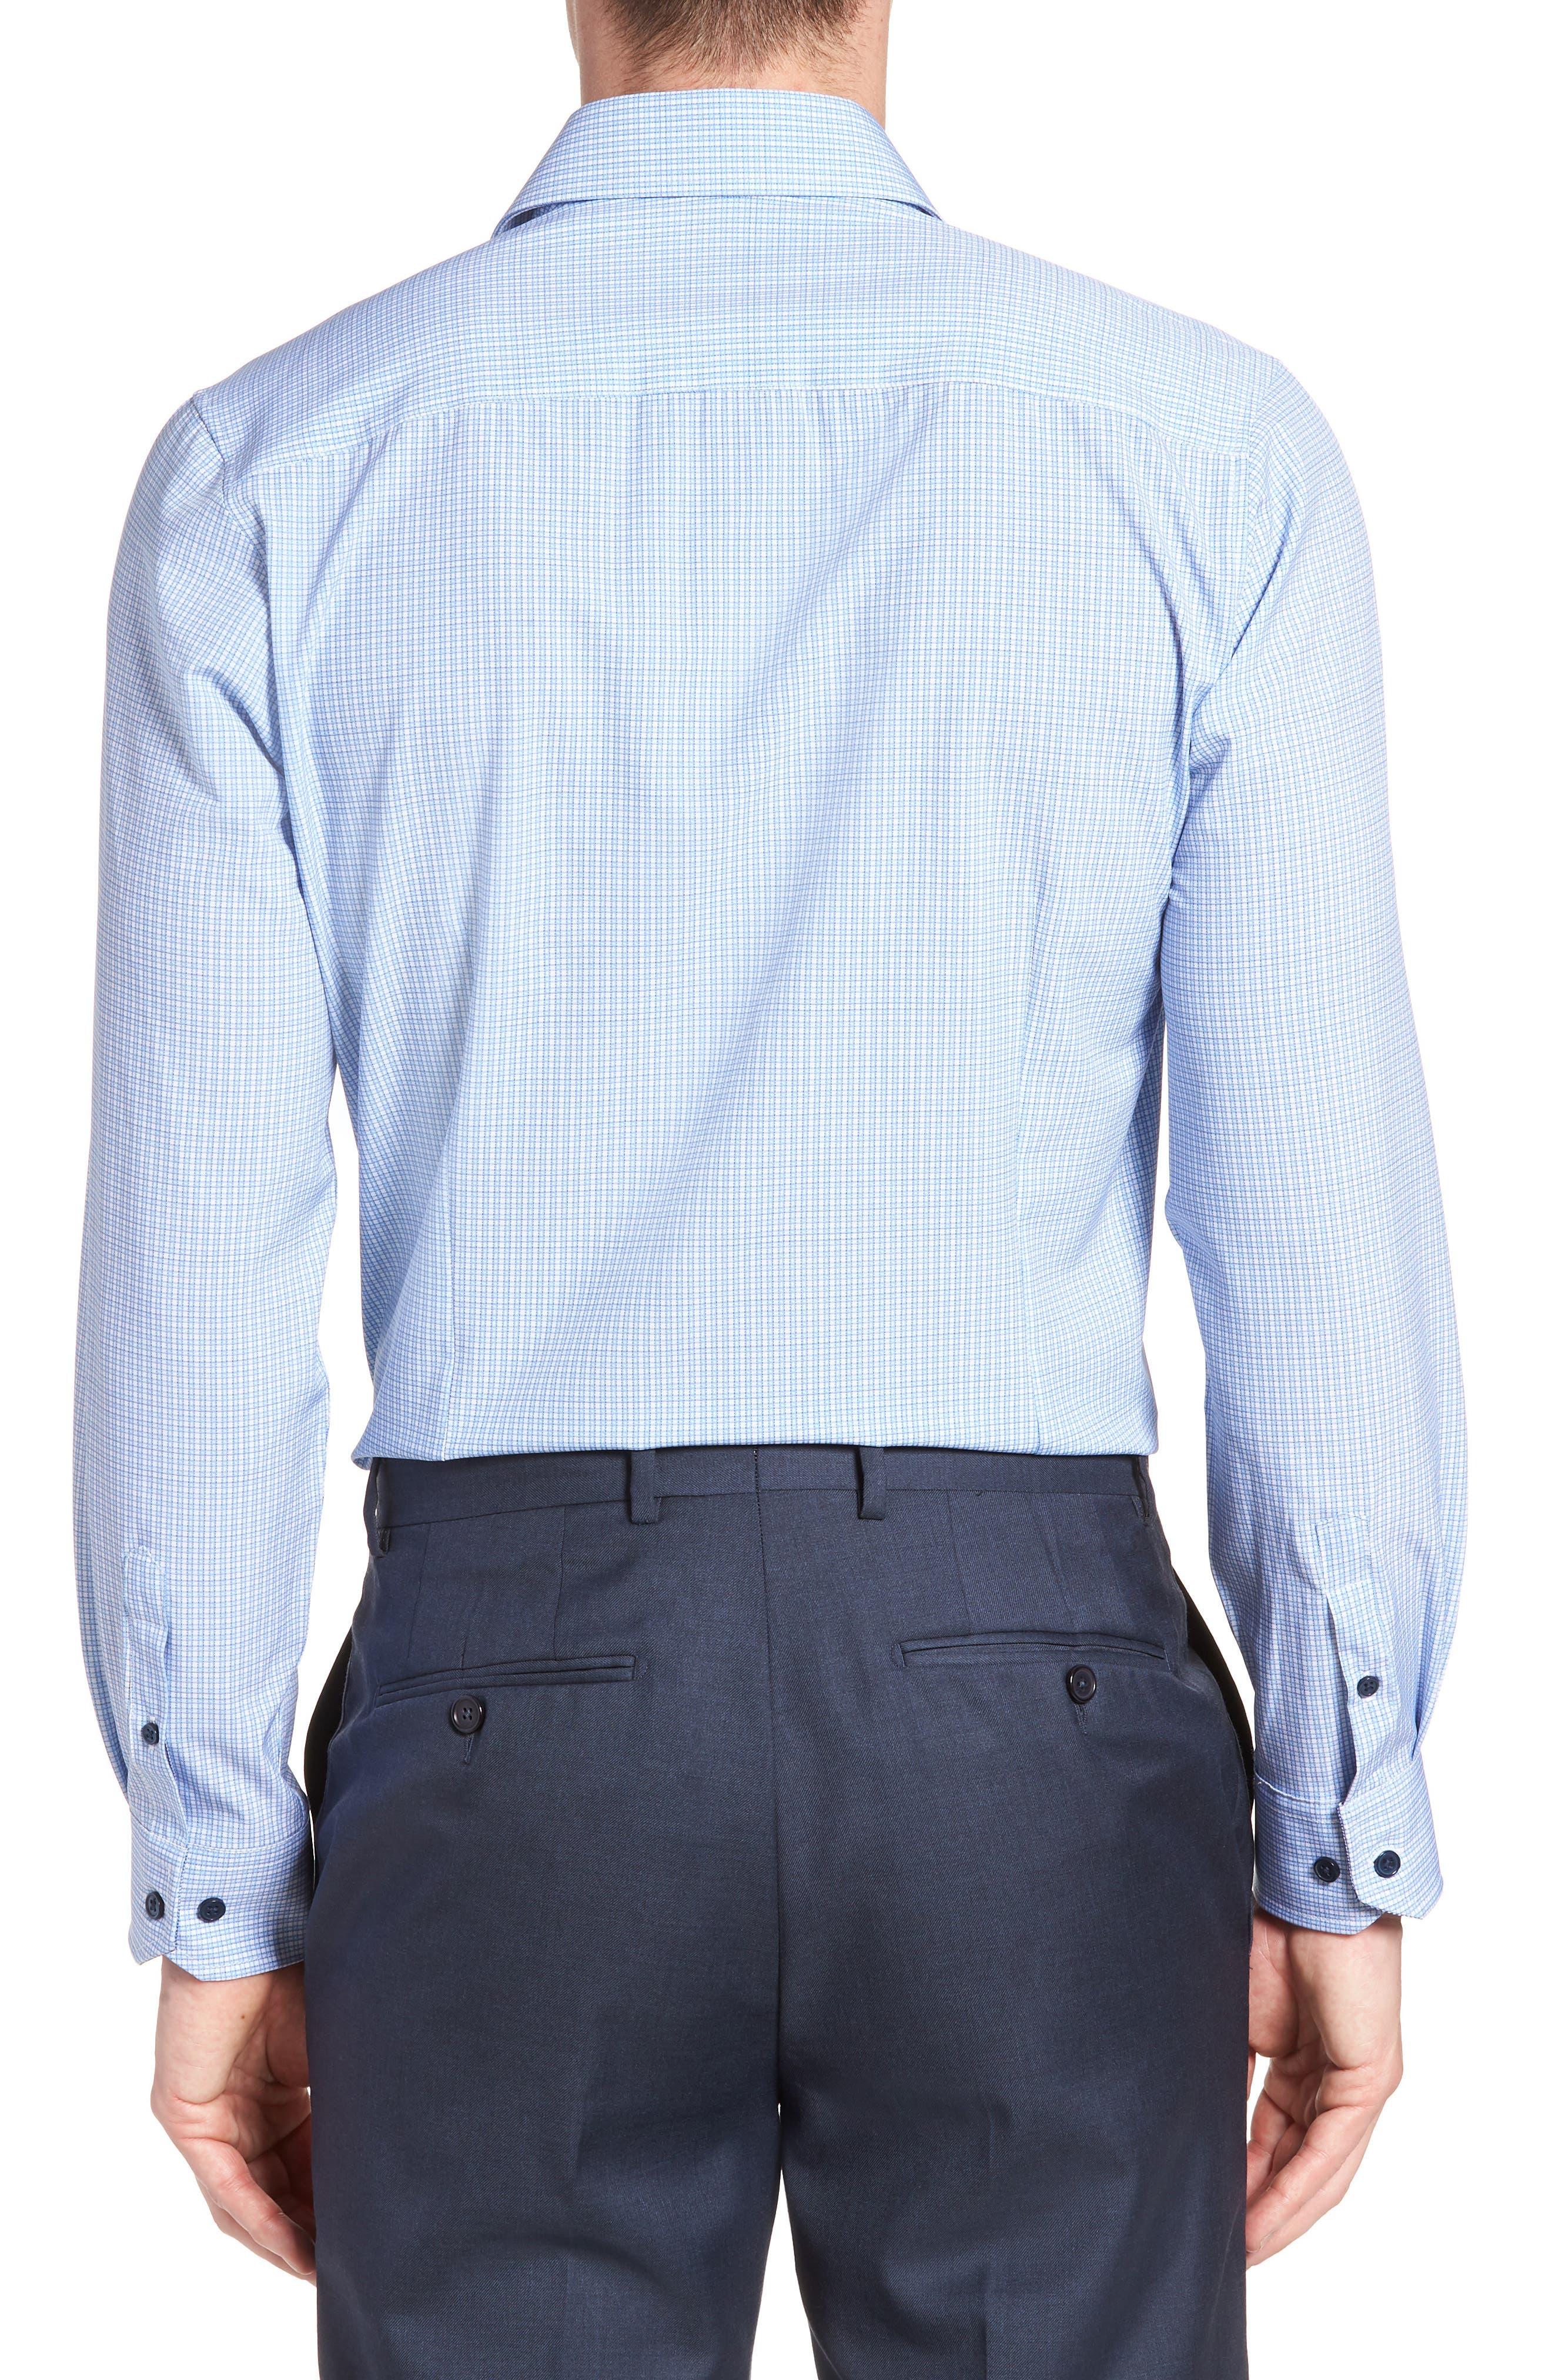 Trim Fit Check 4-Way Stretch Dress Shirt,                             Alternate thumbnail 3, color,                             BLUE